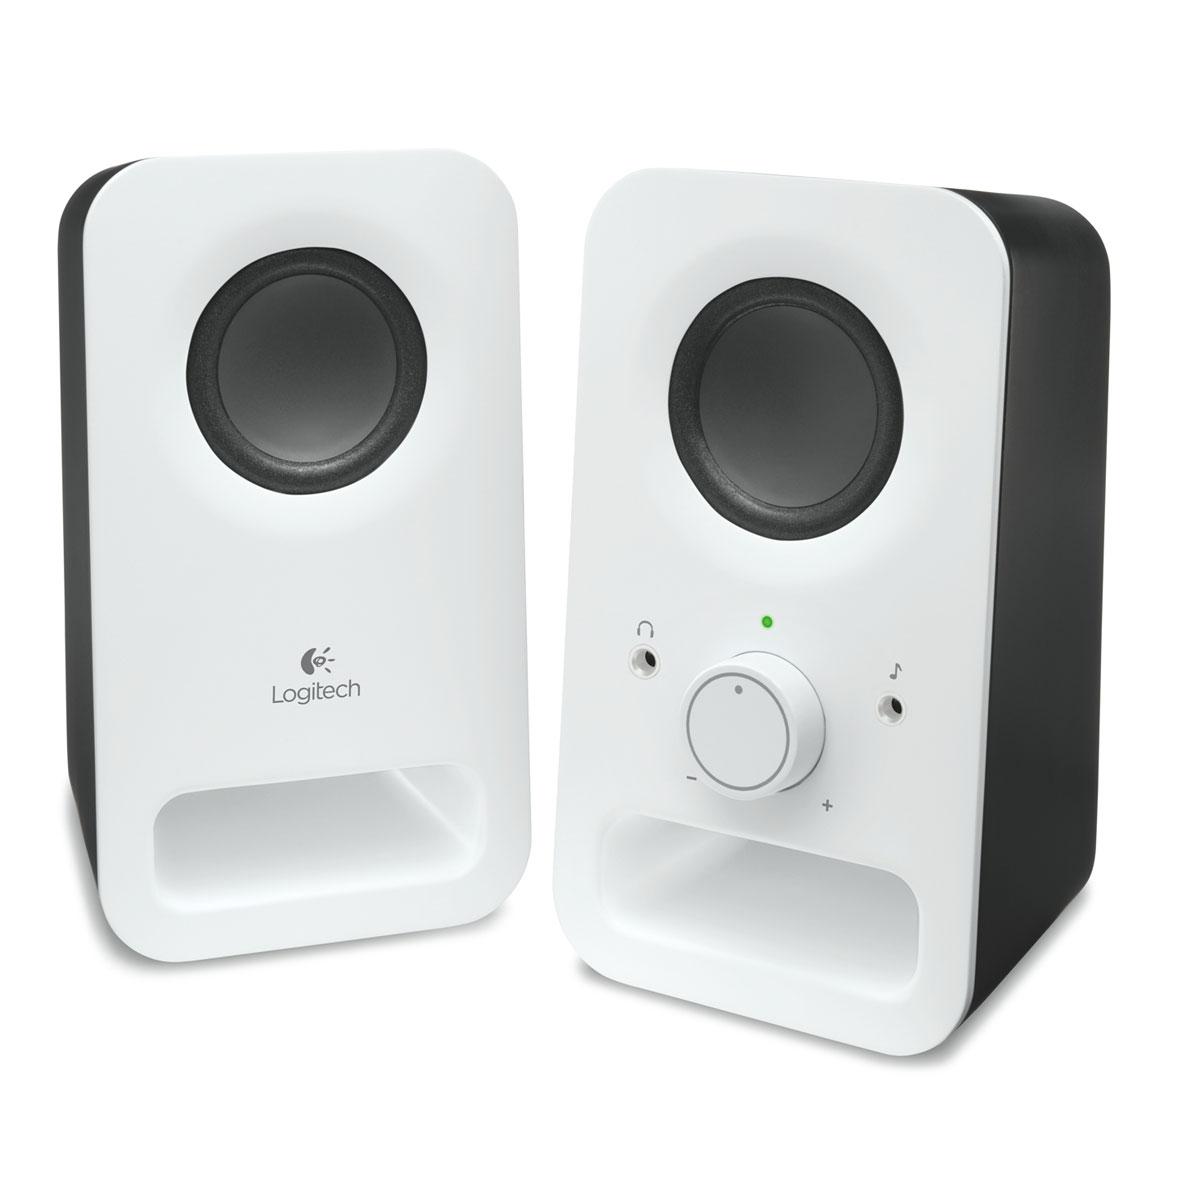 Enceinte PC Logitech Multimedia Speakers Z150 Blanc Ensemble 2.0 - 3 Watts - Jack 3.5 mm